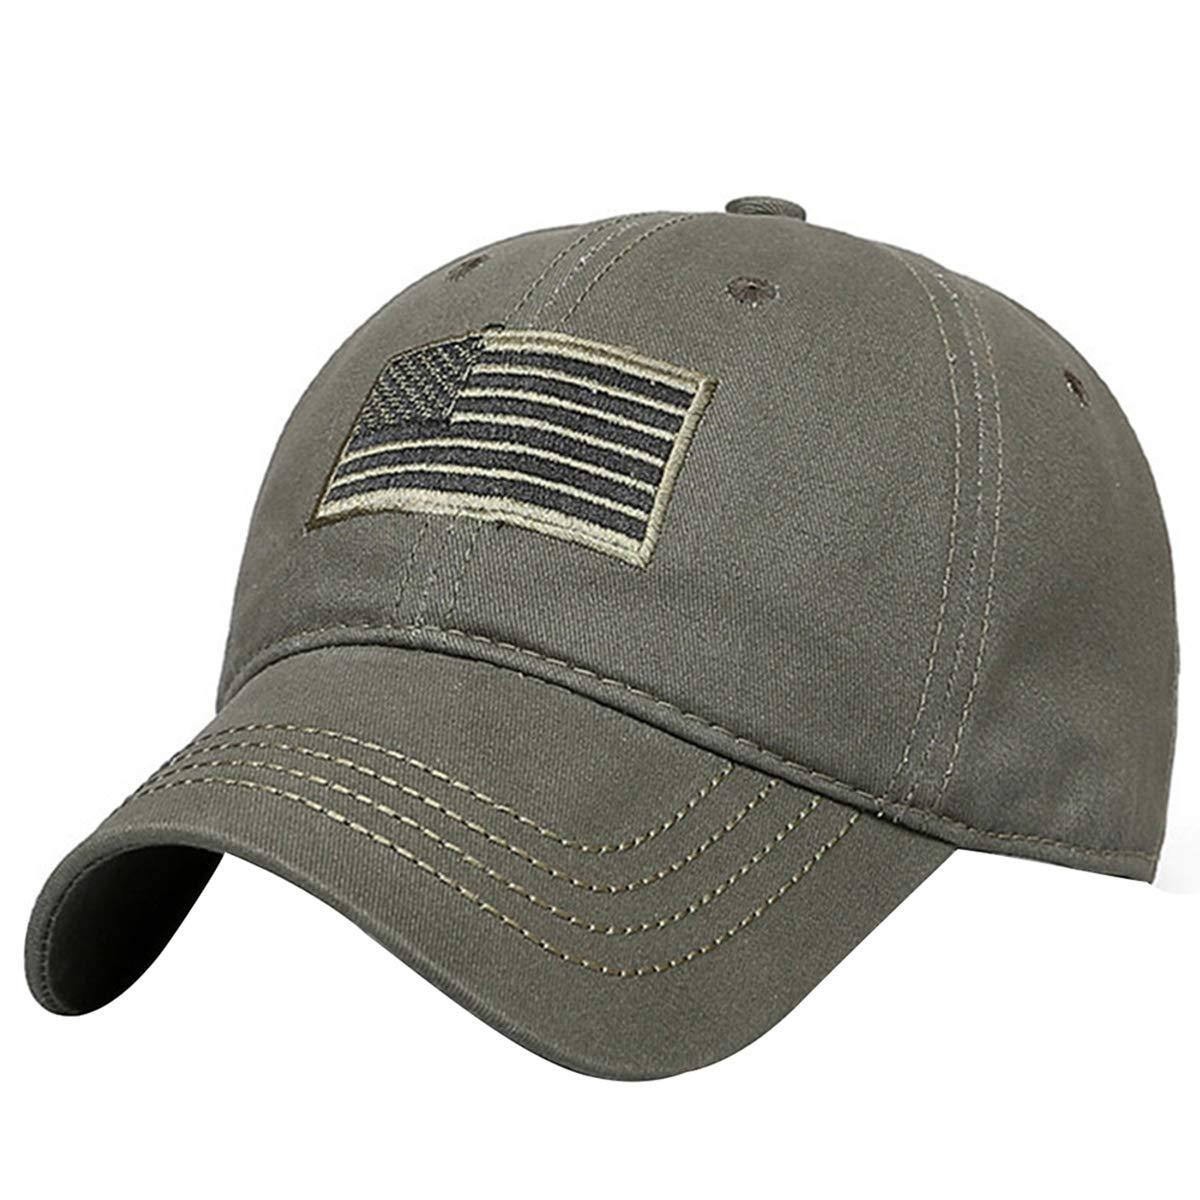 Unisex Men Women Baseball Visors Hat Adjustable Couple Dad Ball Hat Caps Hip Hop Camouflage Youth Teen Casual Cap